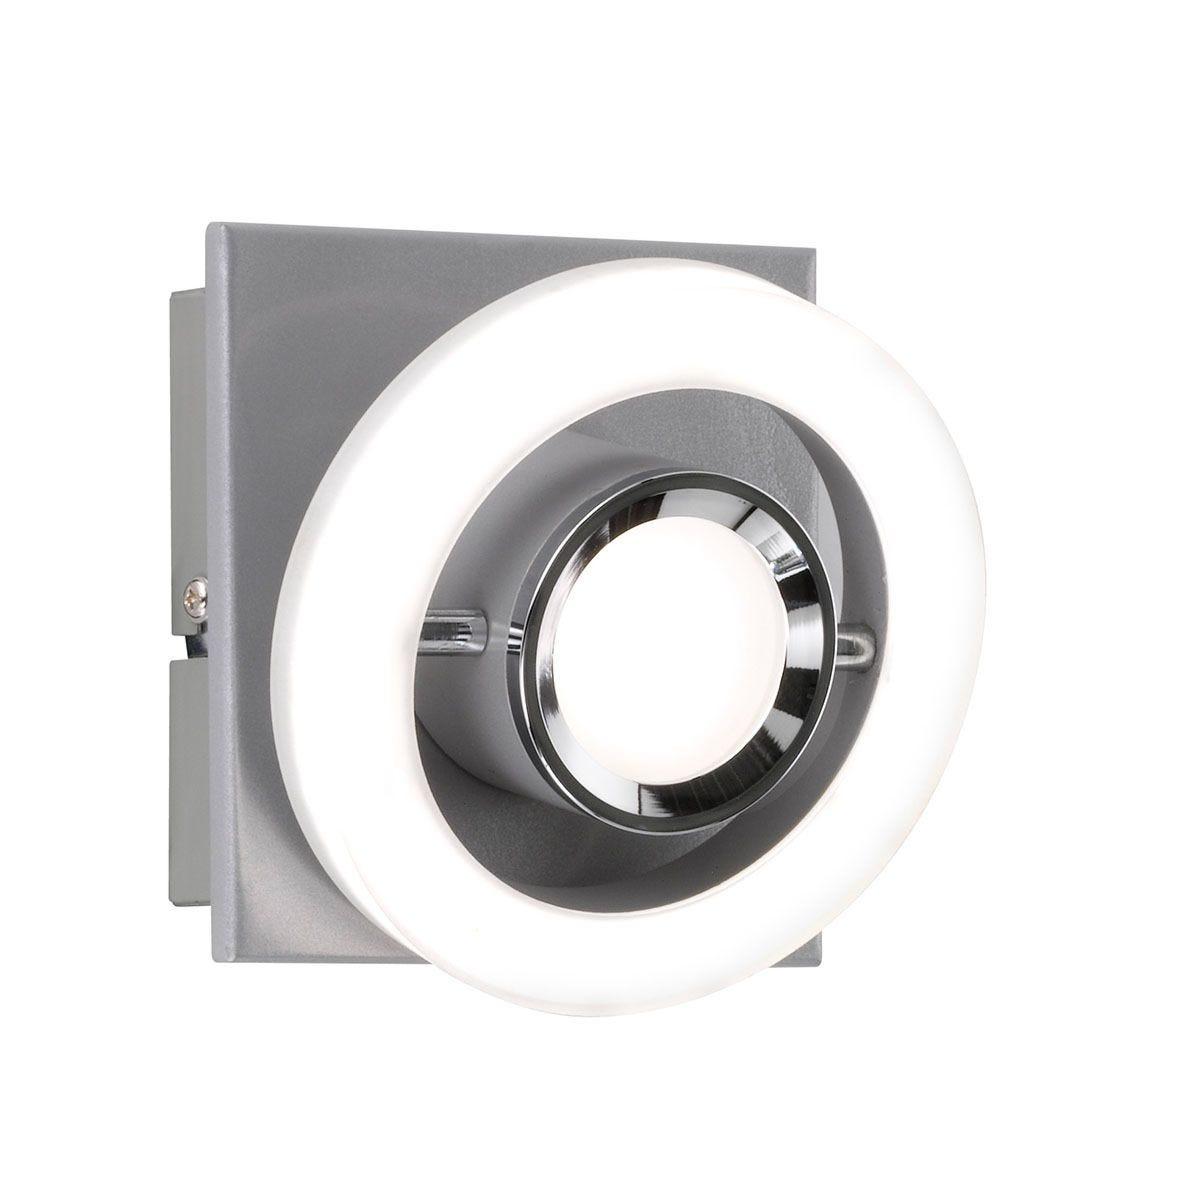 Wofi Detroit LED Wall Lamp - Silver